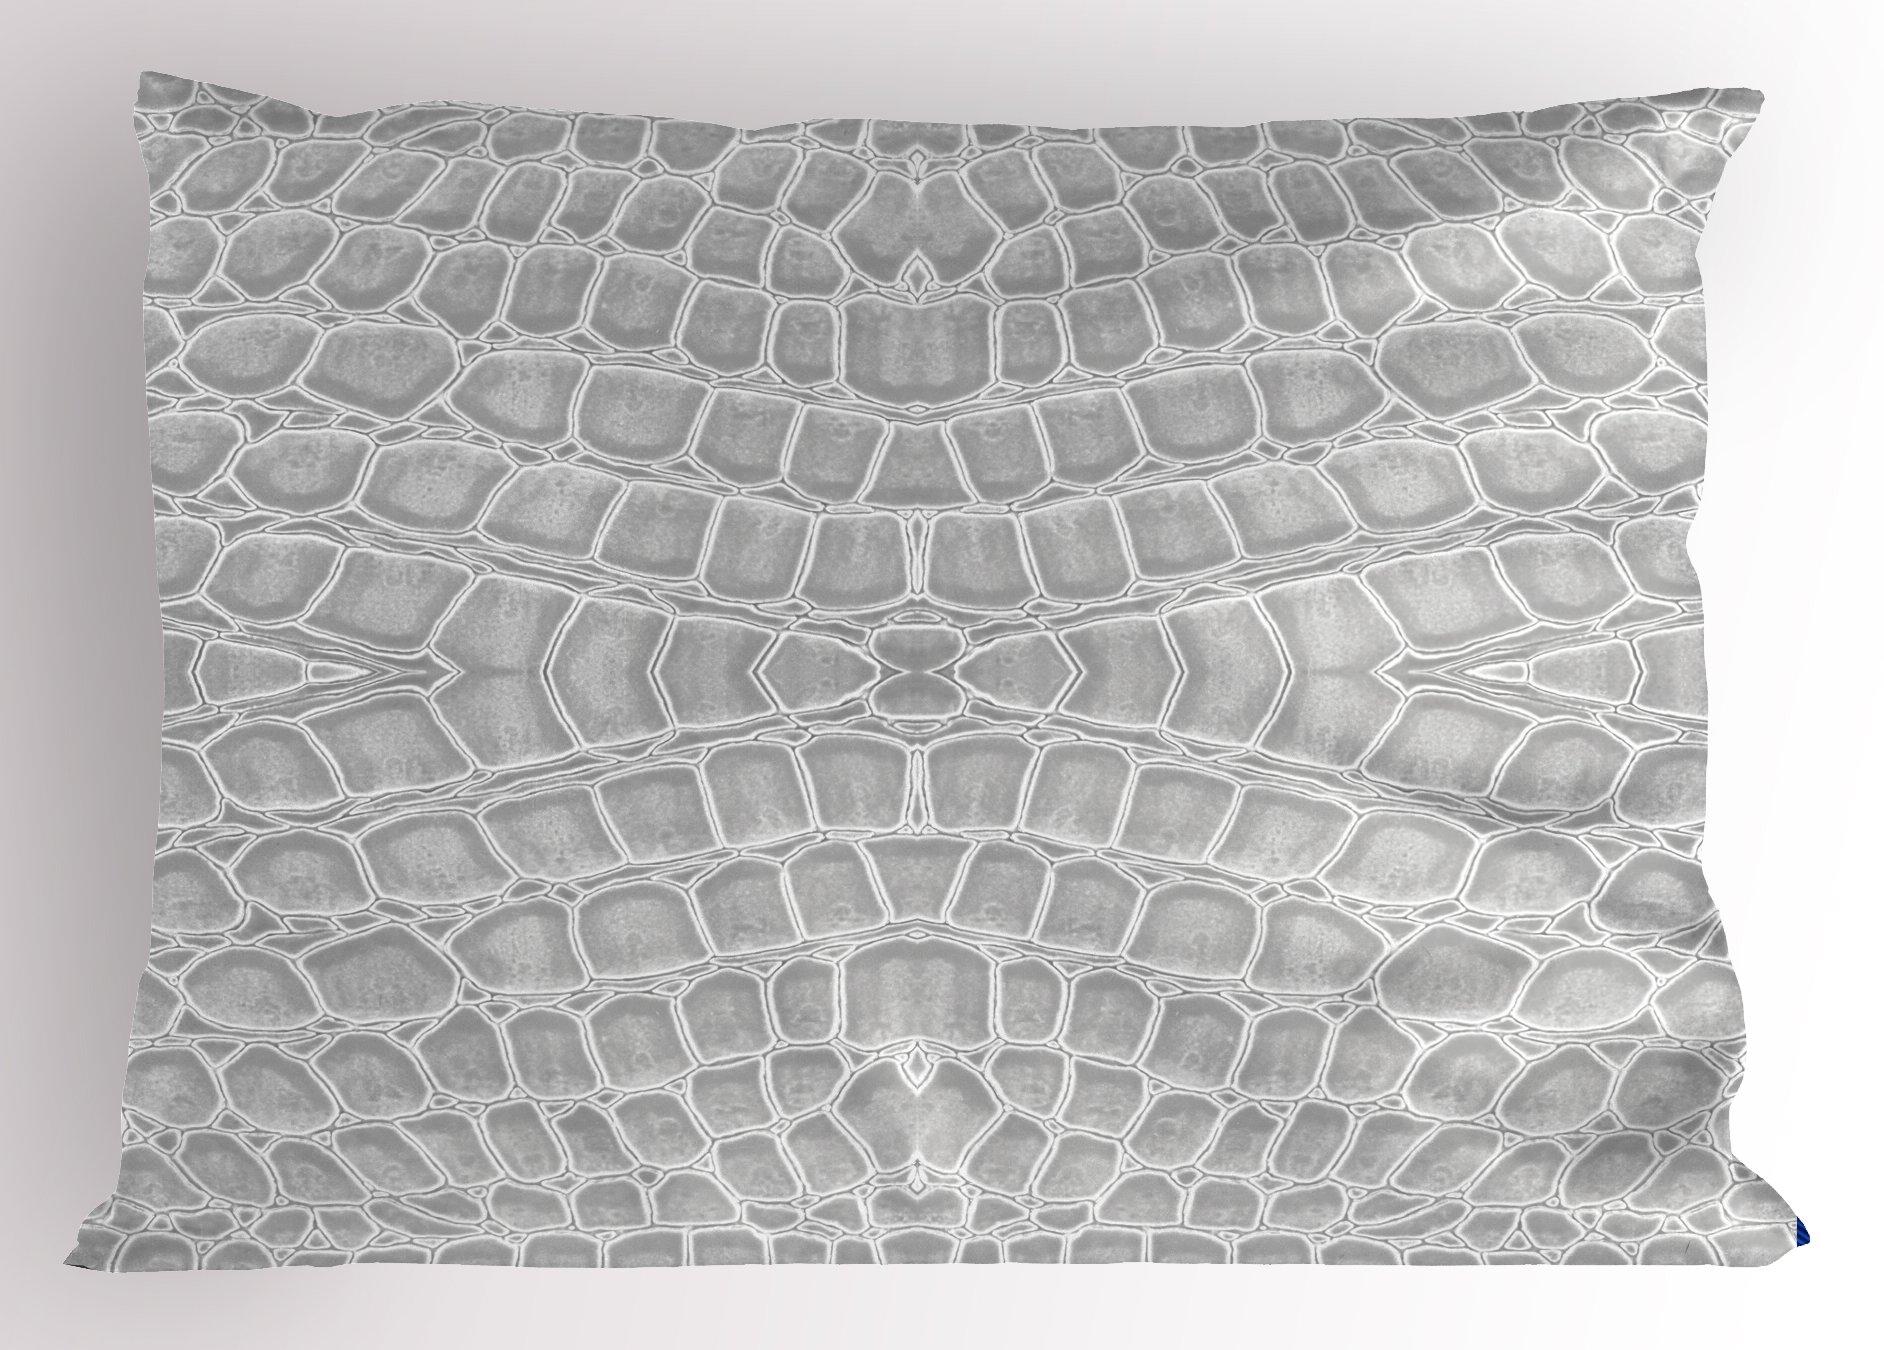 Lunarable Animal Print Pillow Sham, Crocodile Leather Pattern in Material Fashion Theme Design Print, Decorative Standard Size Printed Pillowcase, 26 X 20 inches, Light Gray